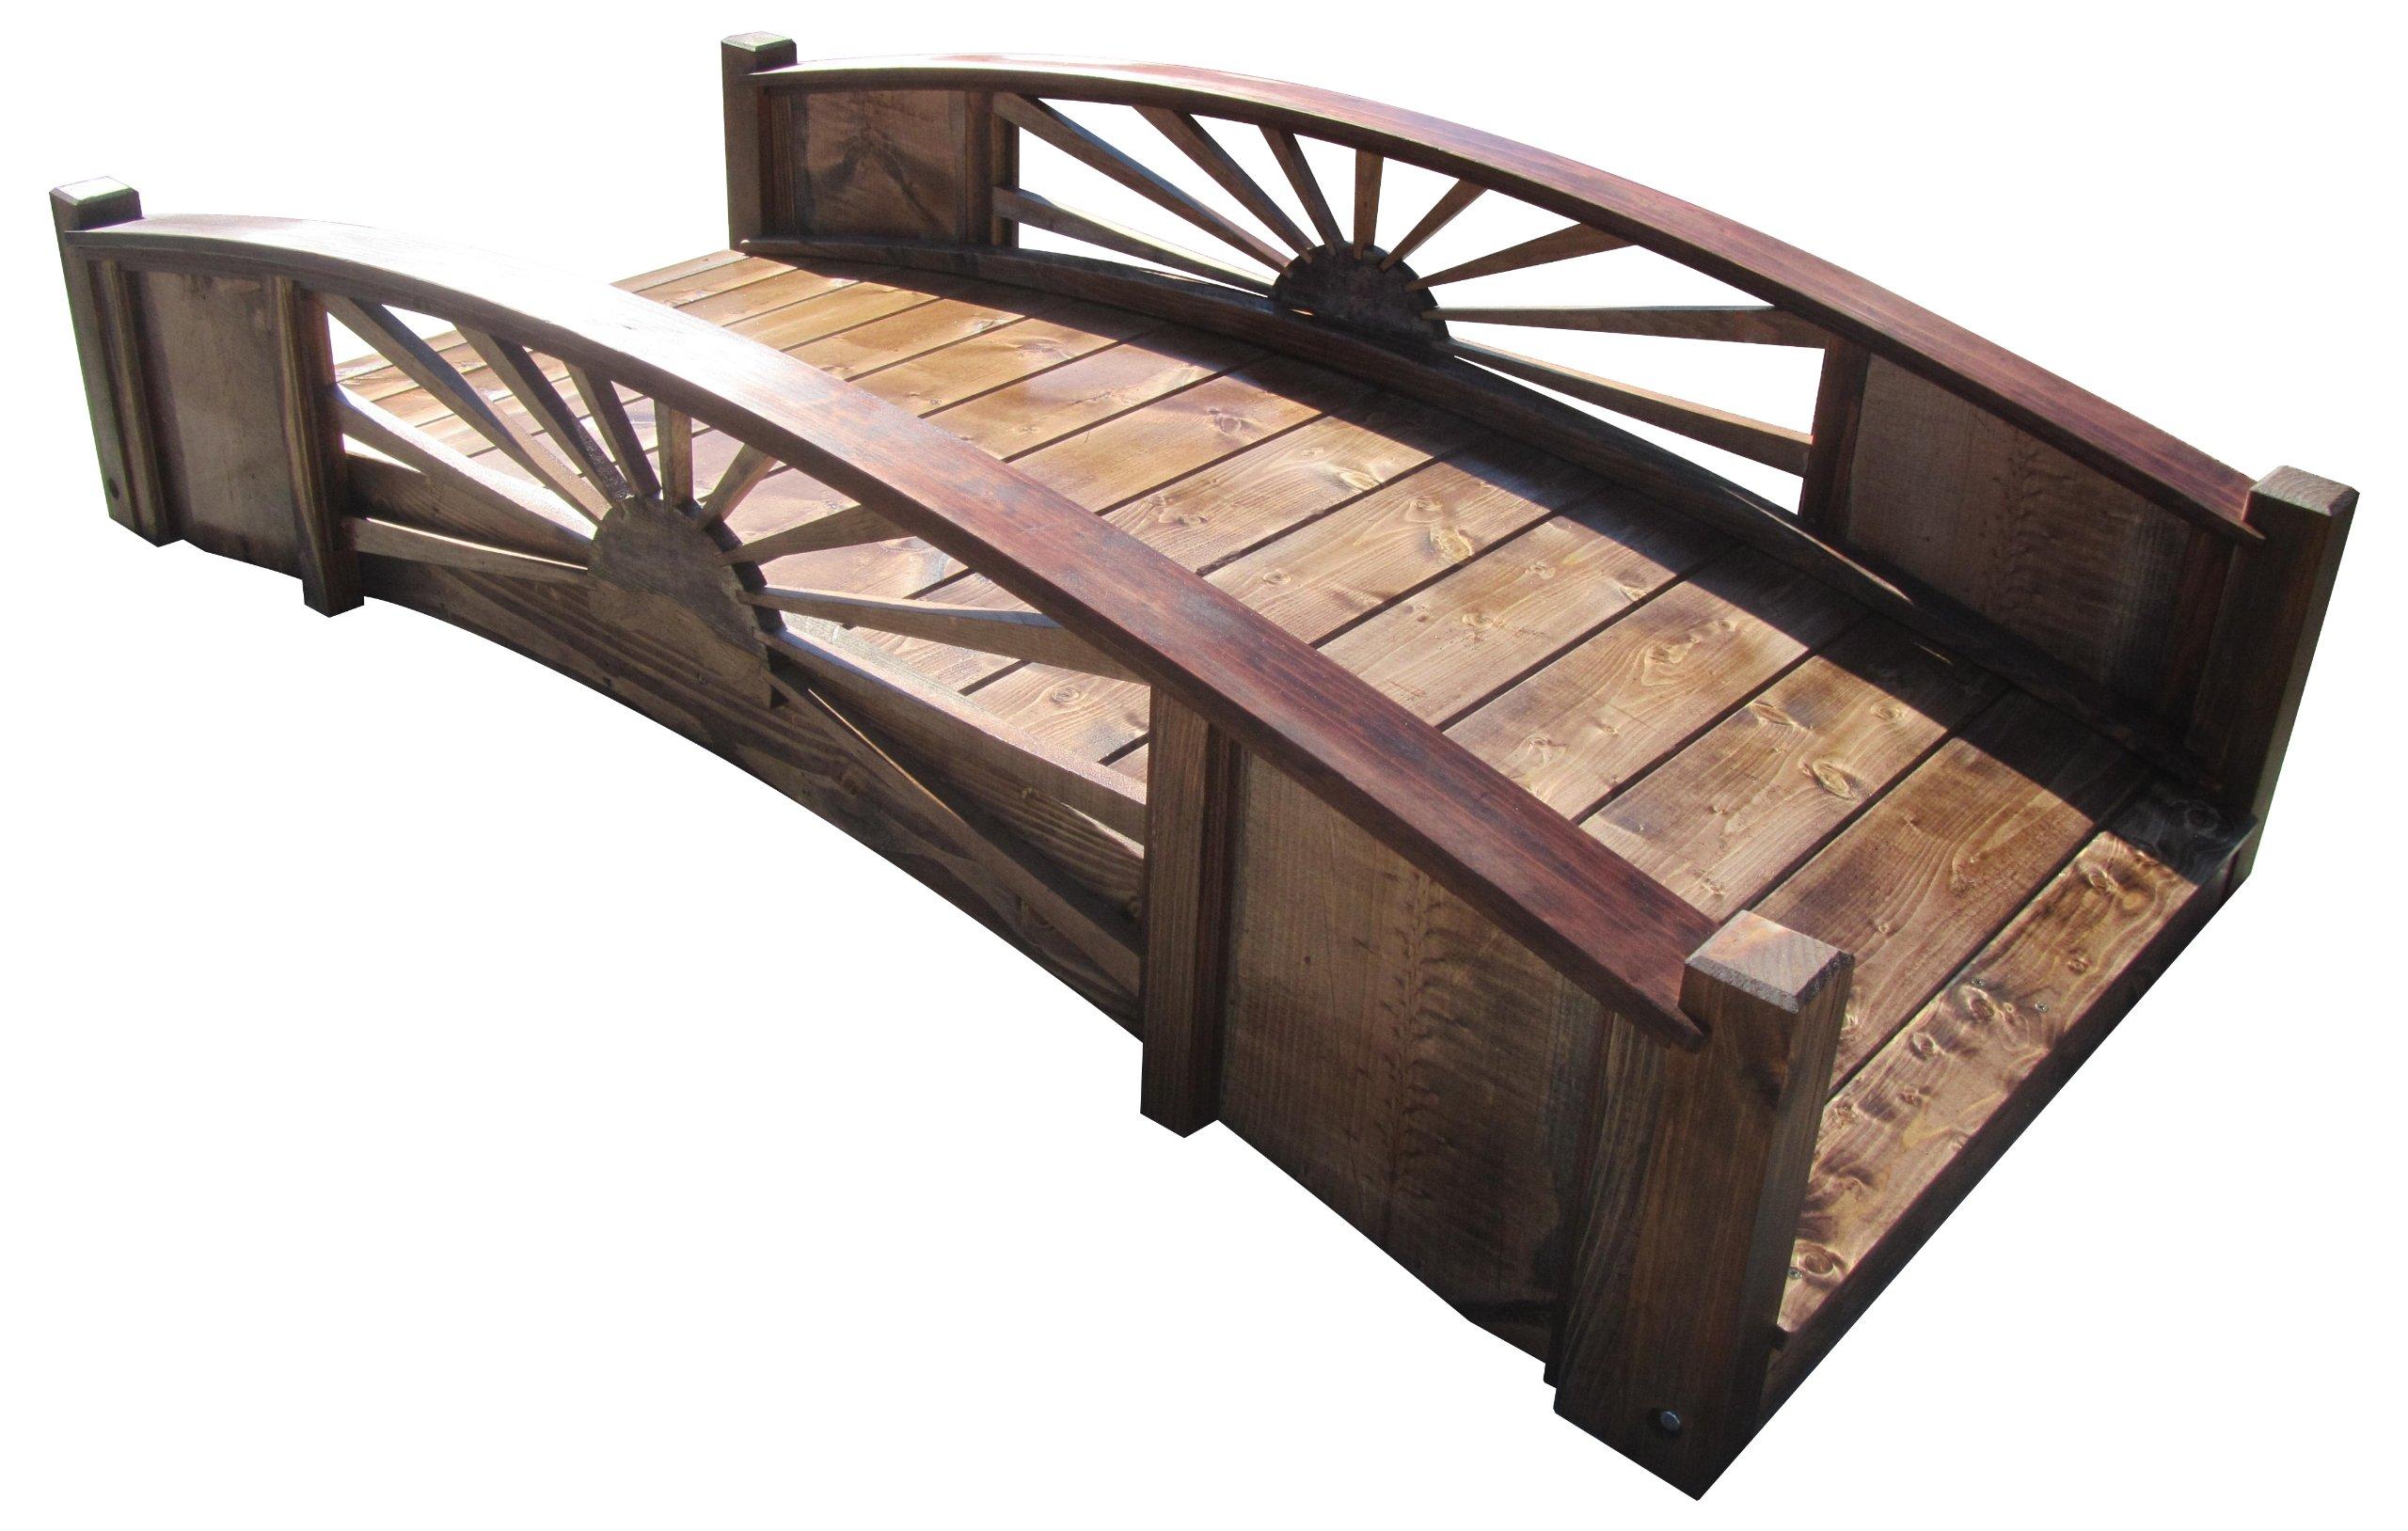 SamsGazebos Sunburst Wood Garden Bridge, 6-Feet, Brown